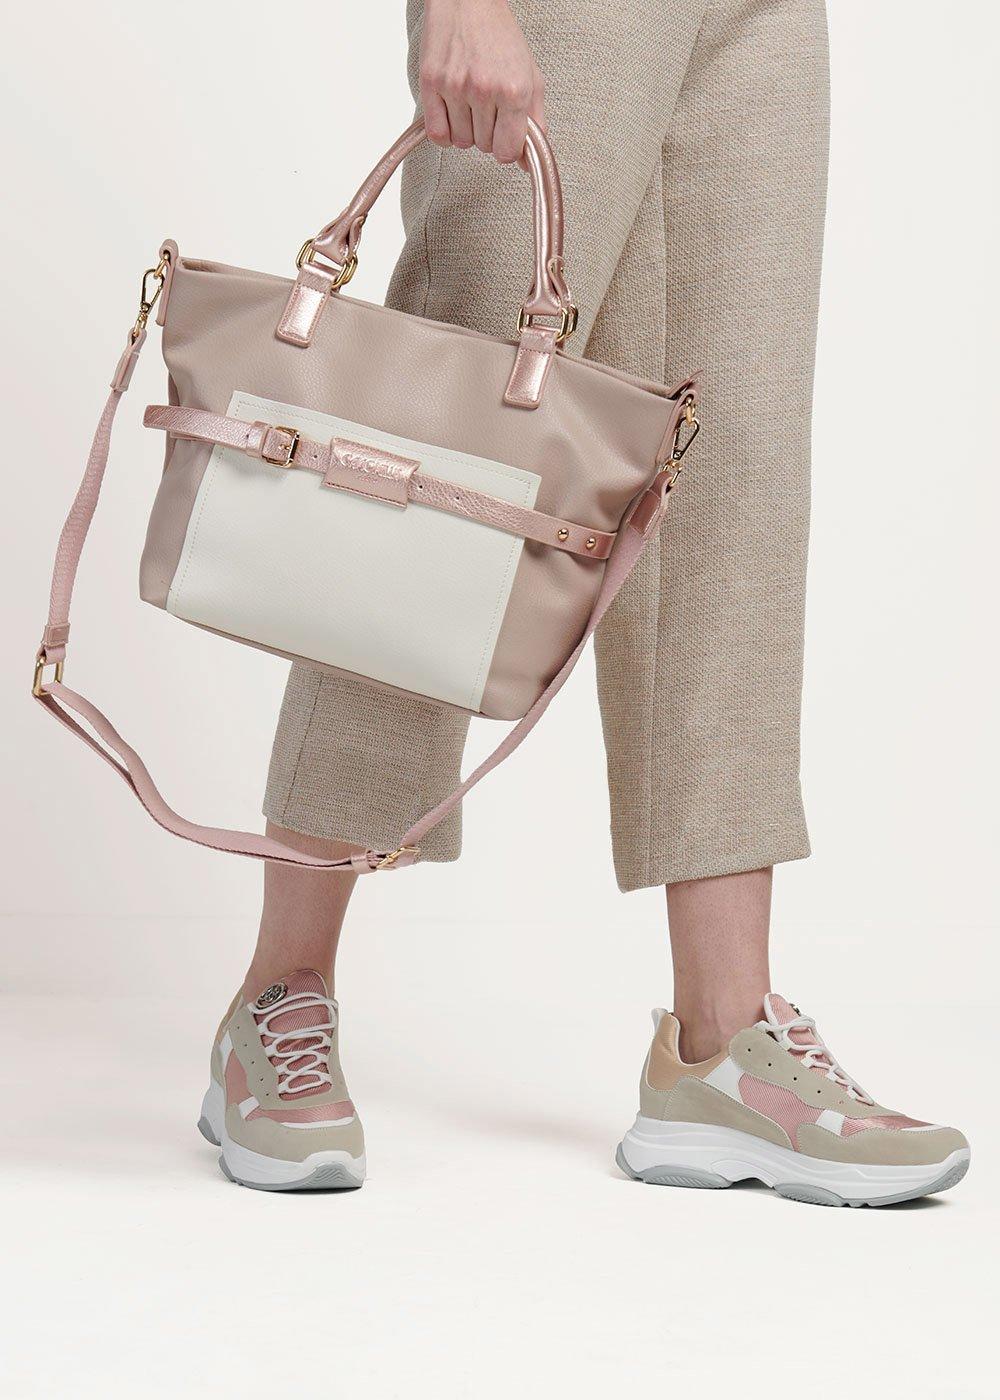 Hand bag Backy bi color - Rosa - Donna